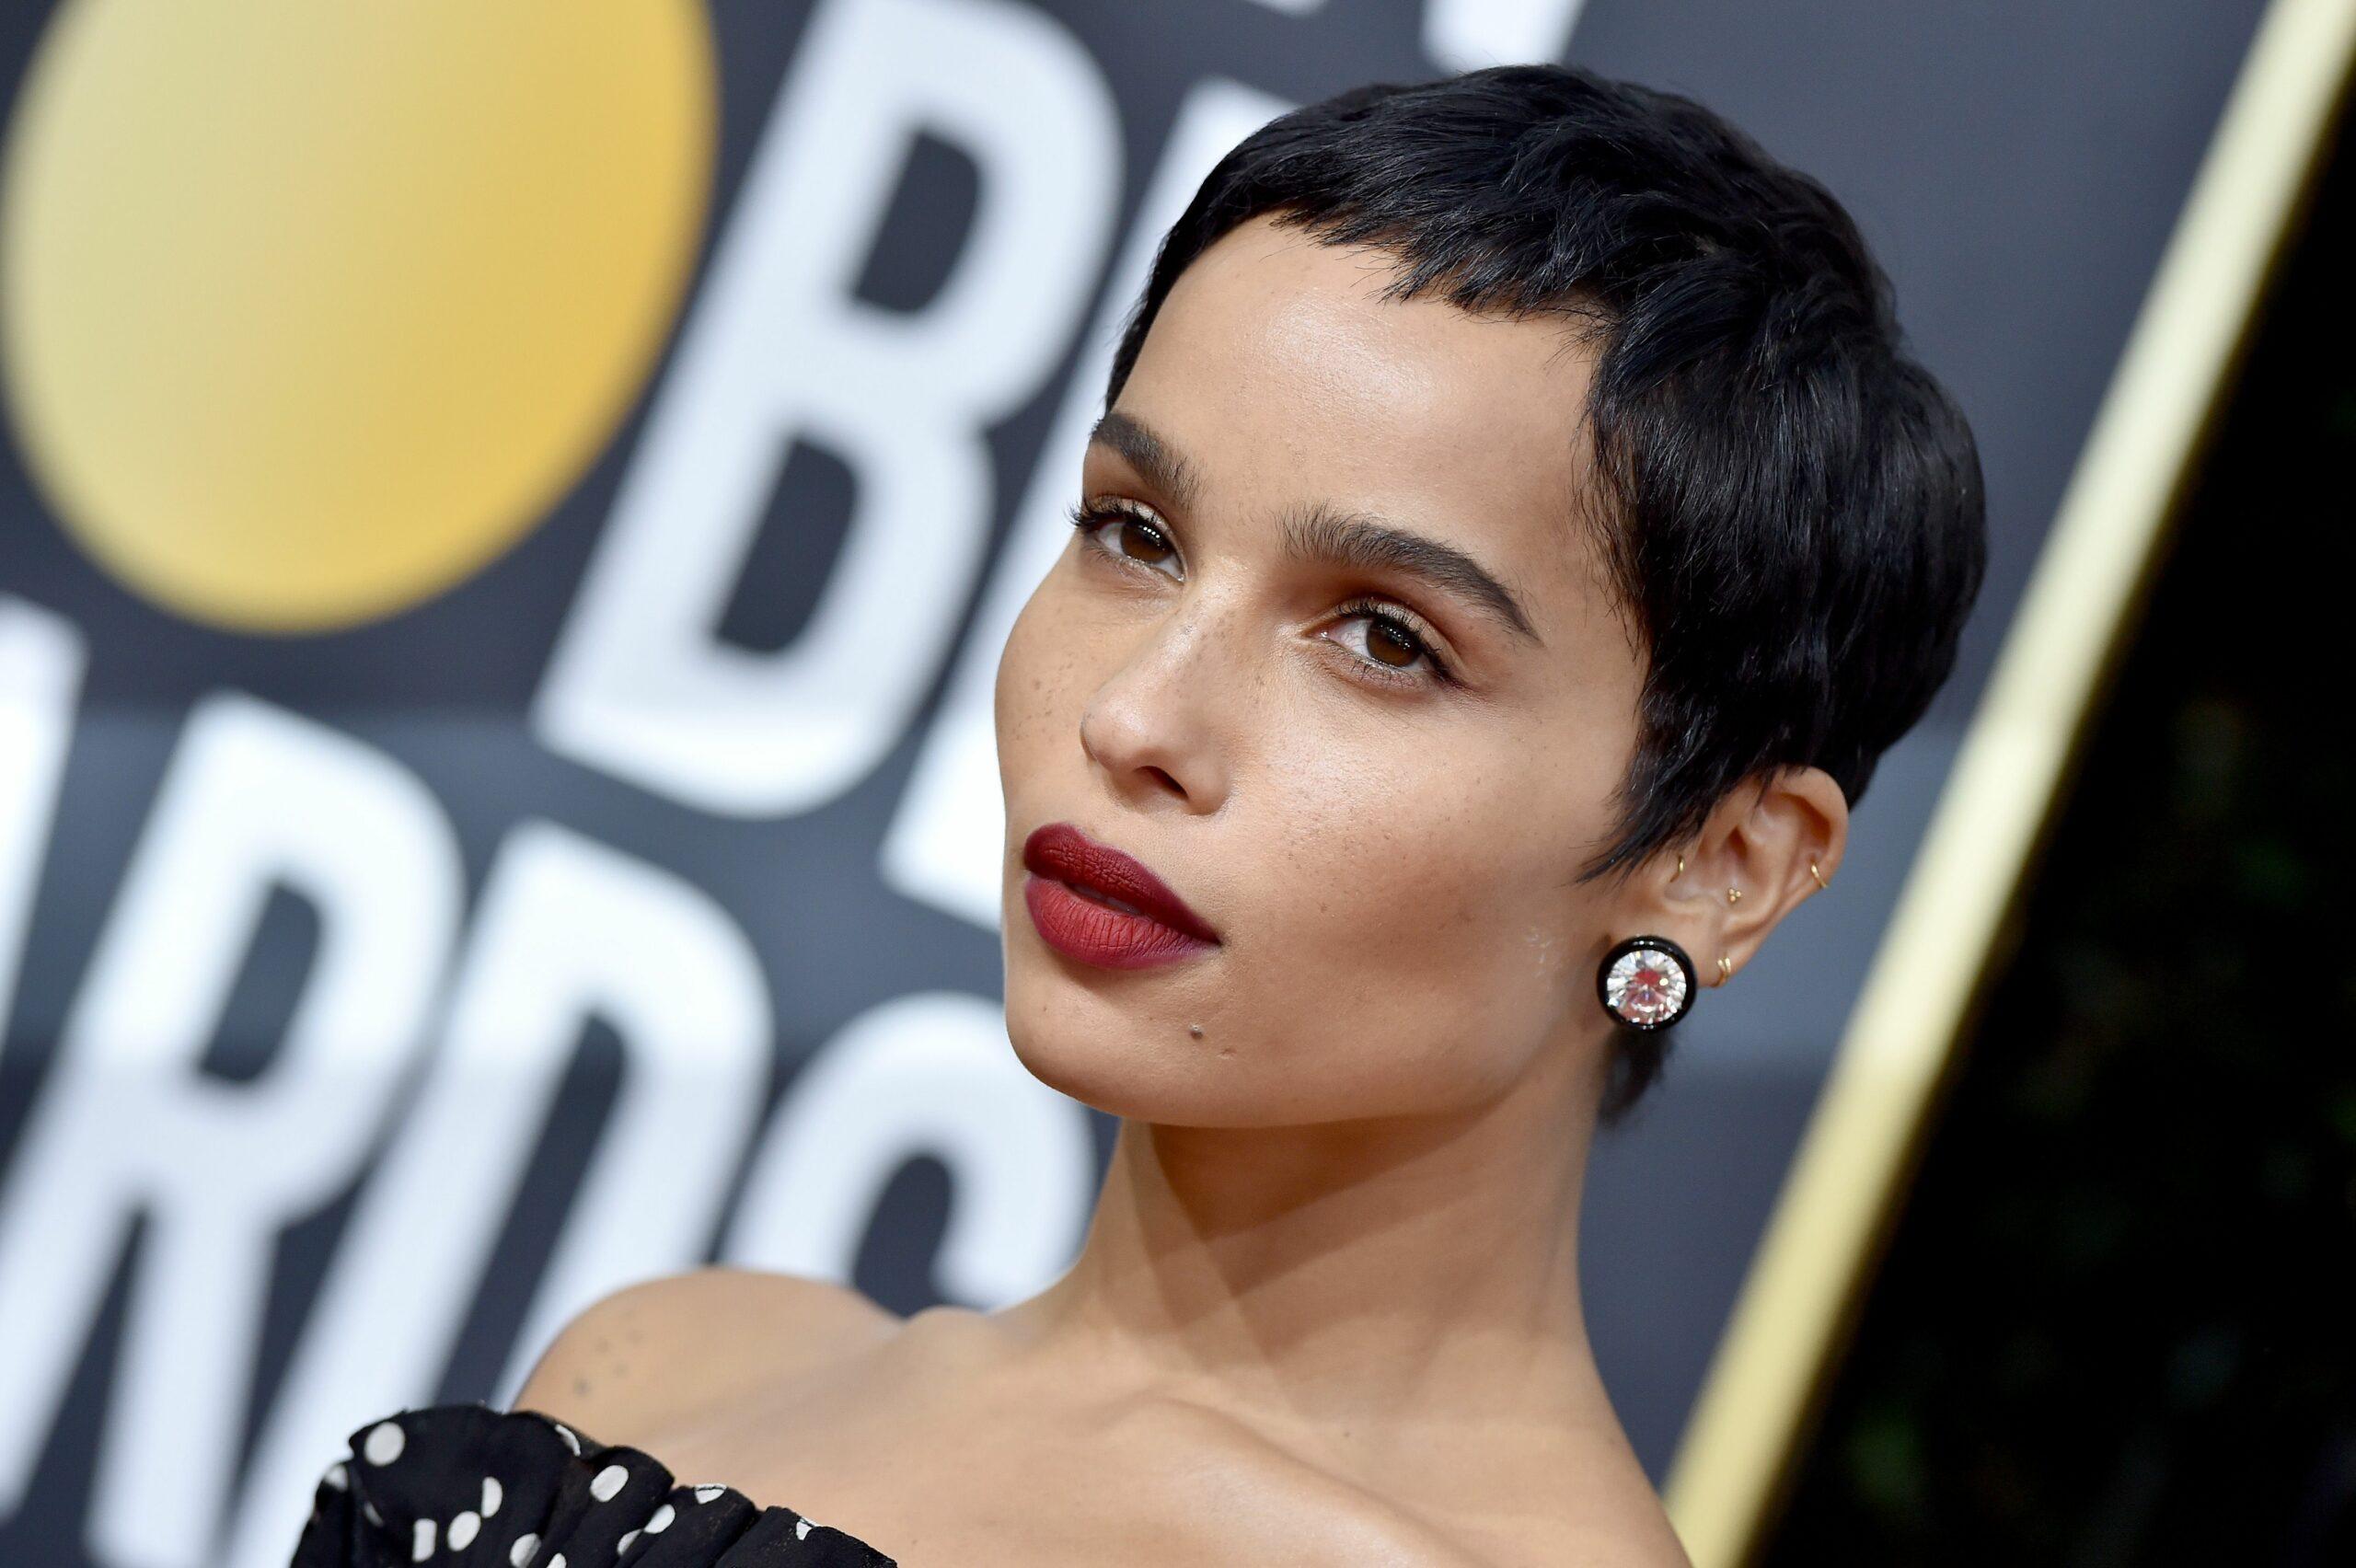 4 Top Golden Globes 2020 Red Carpet Fashion